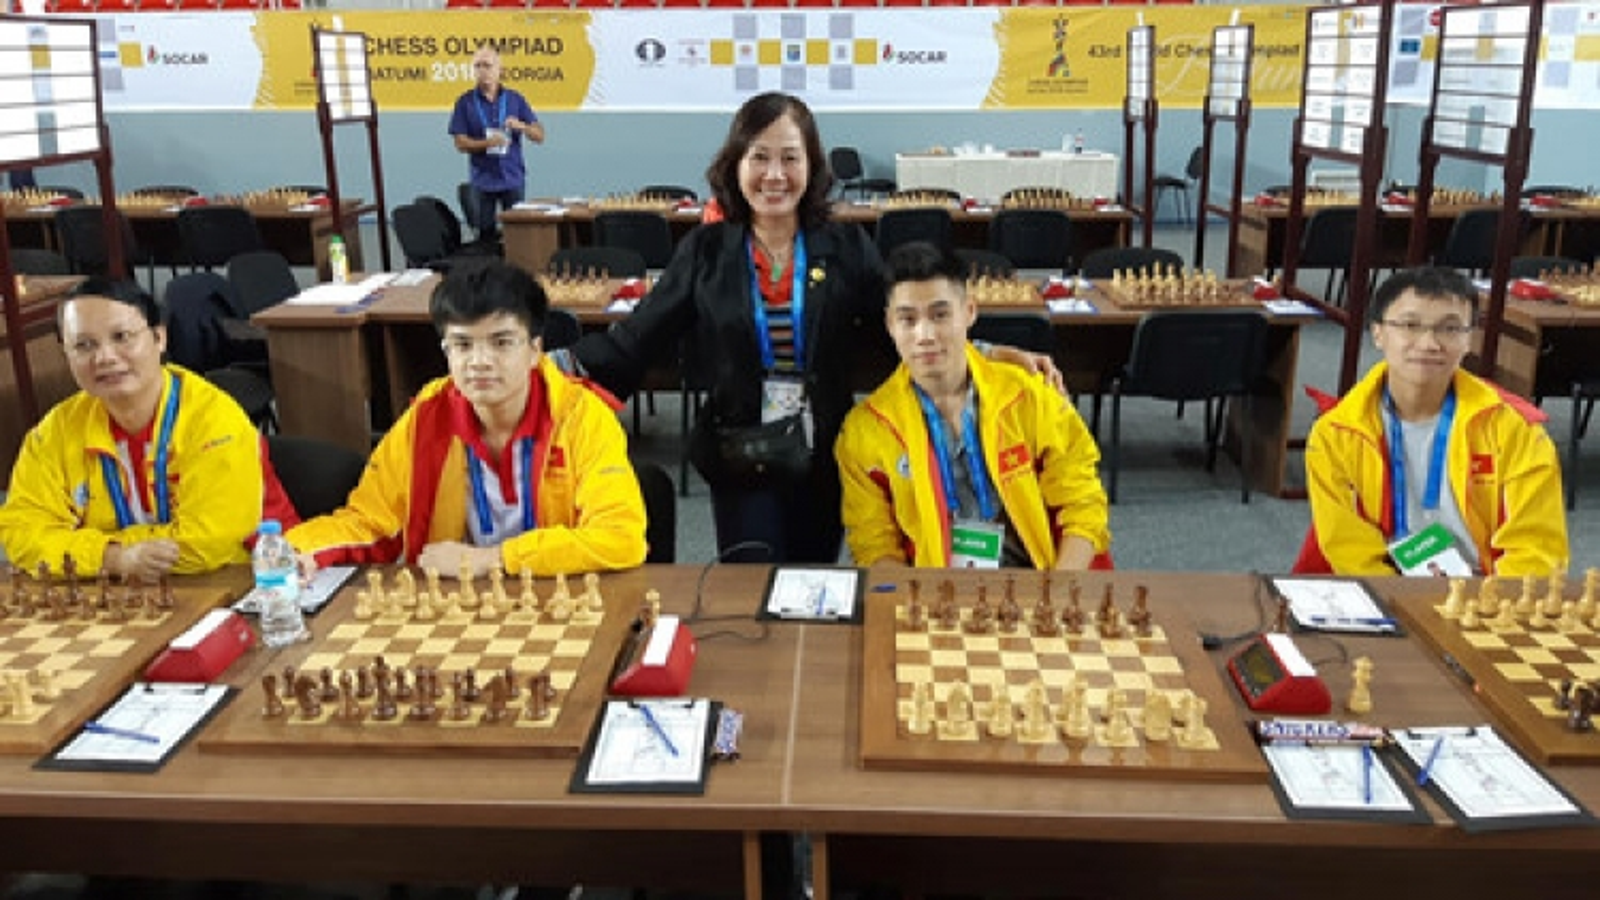 Vietnam continue winning streak at Chess Olympiad